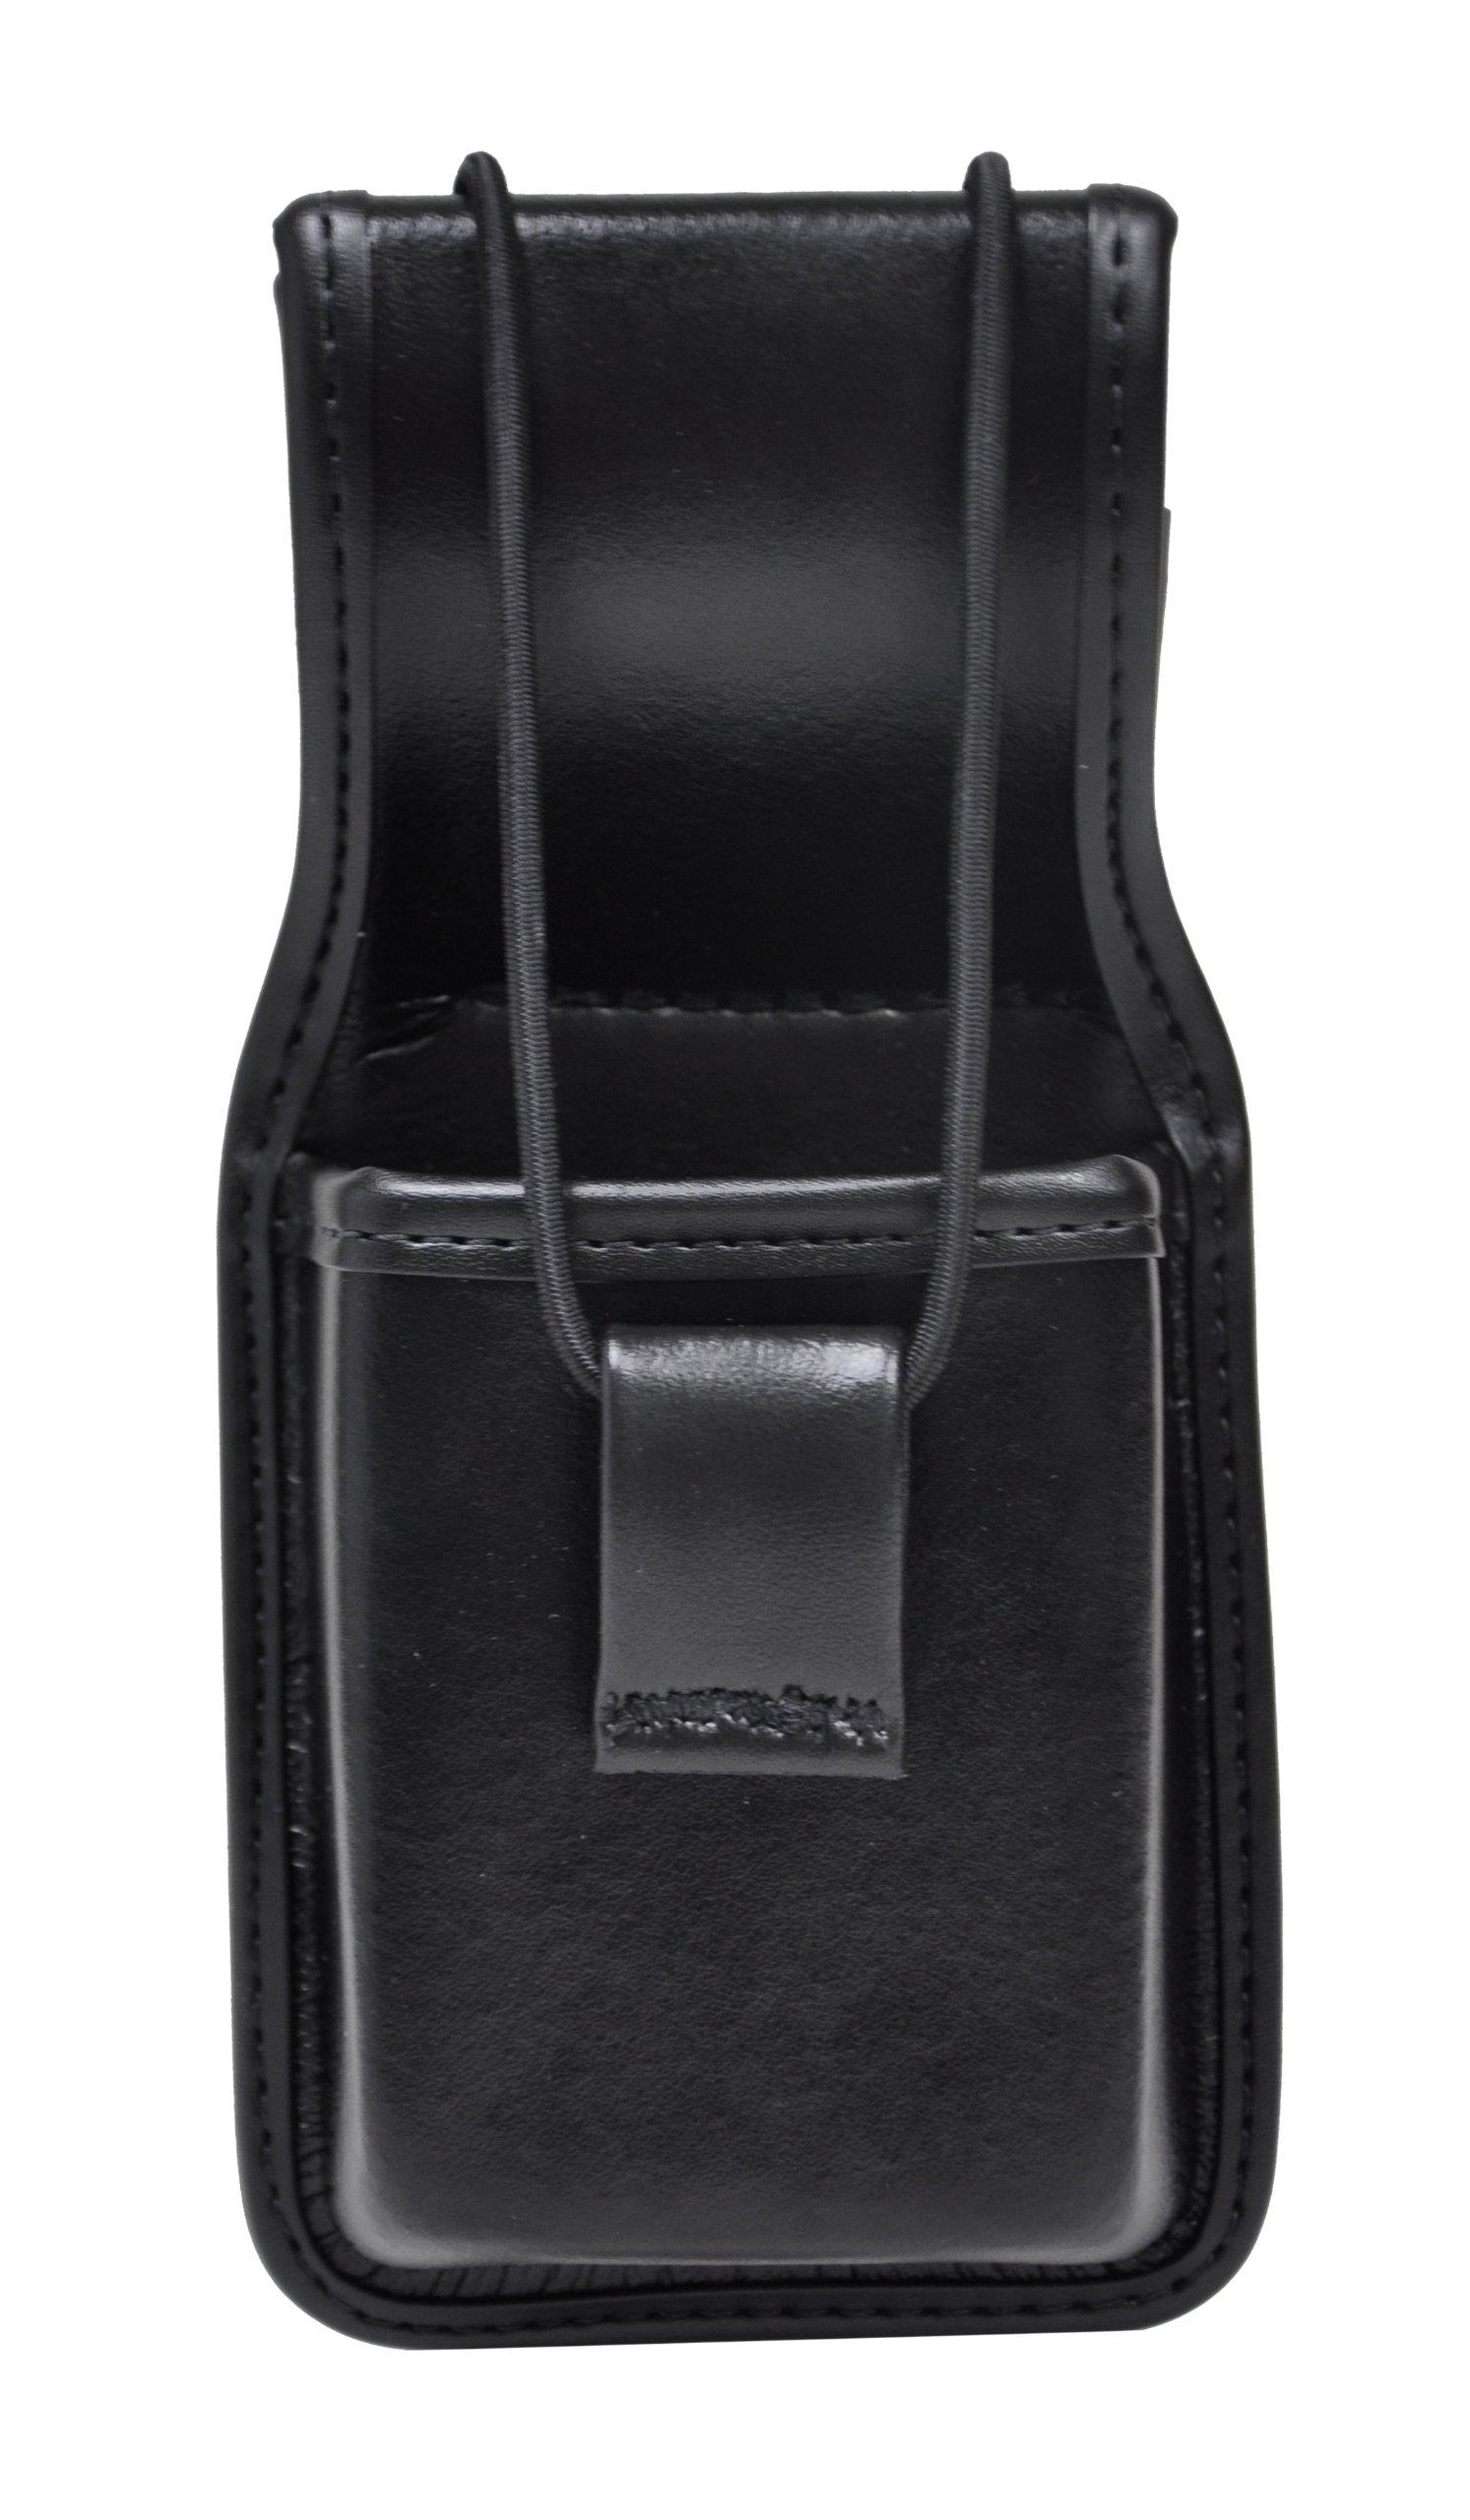 Bianchi AccuMold Elite 7914S Universal Radio Holder with Swivel (Plain Black)